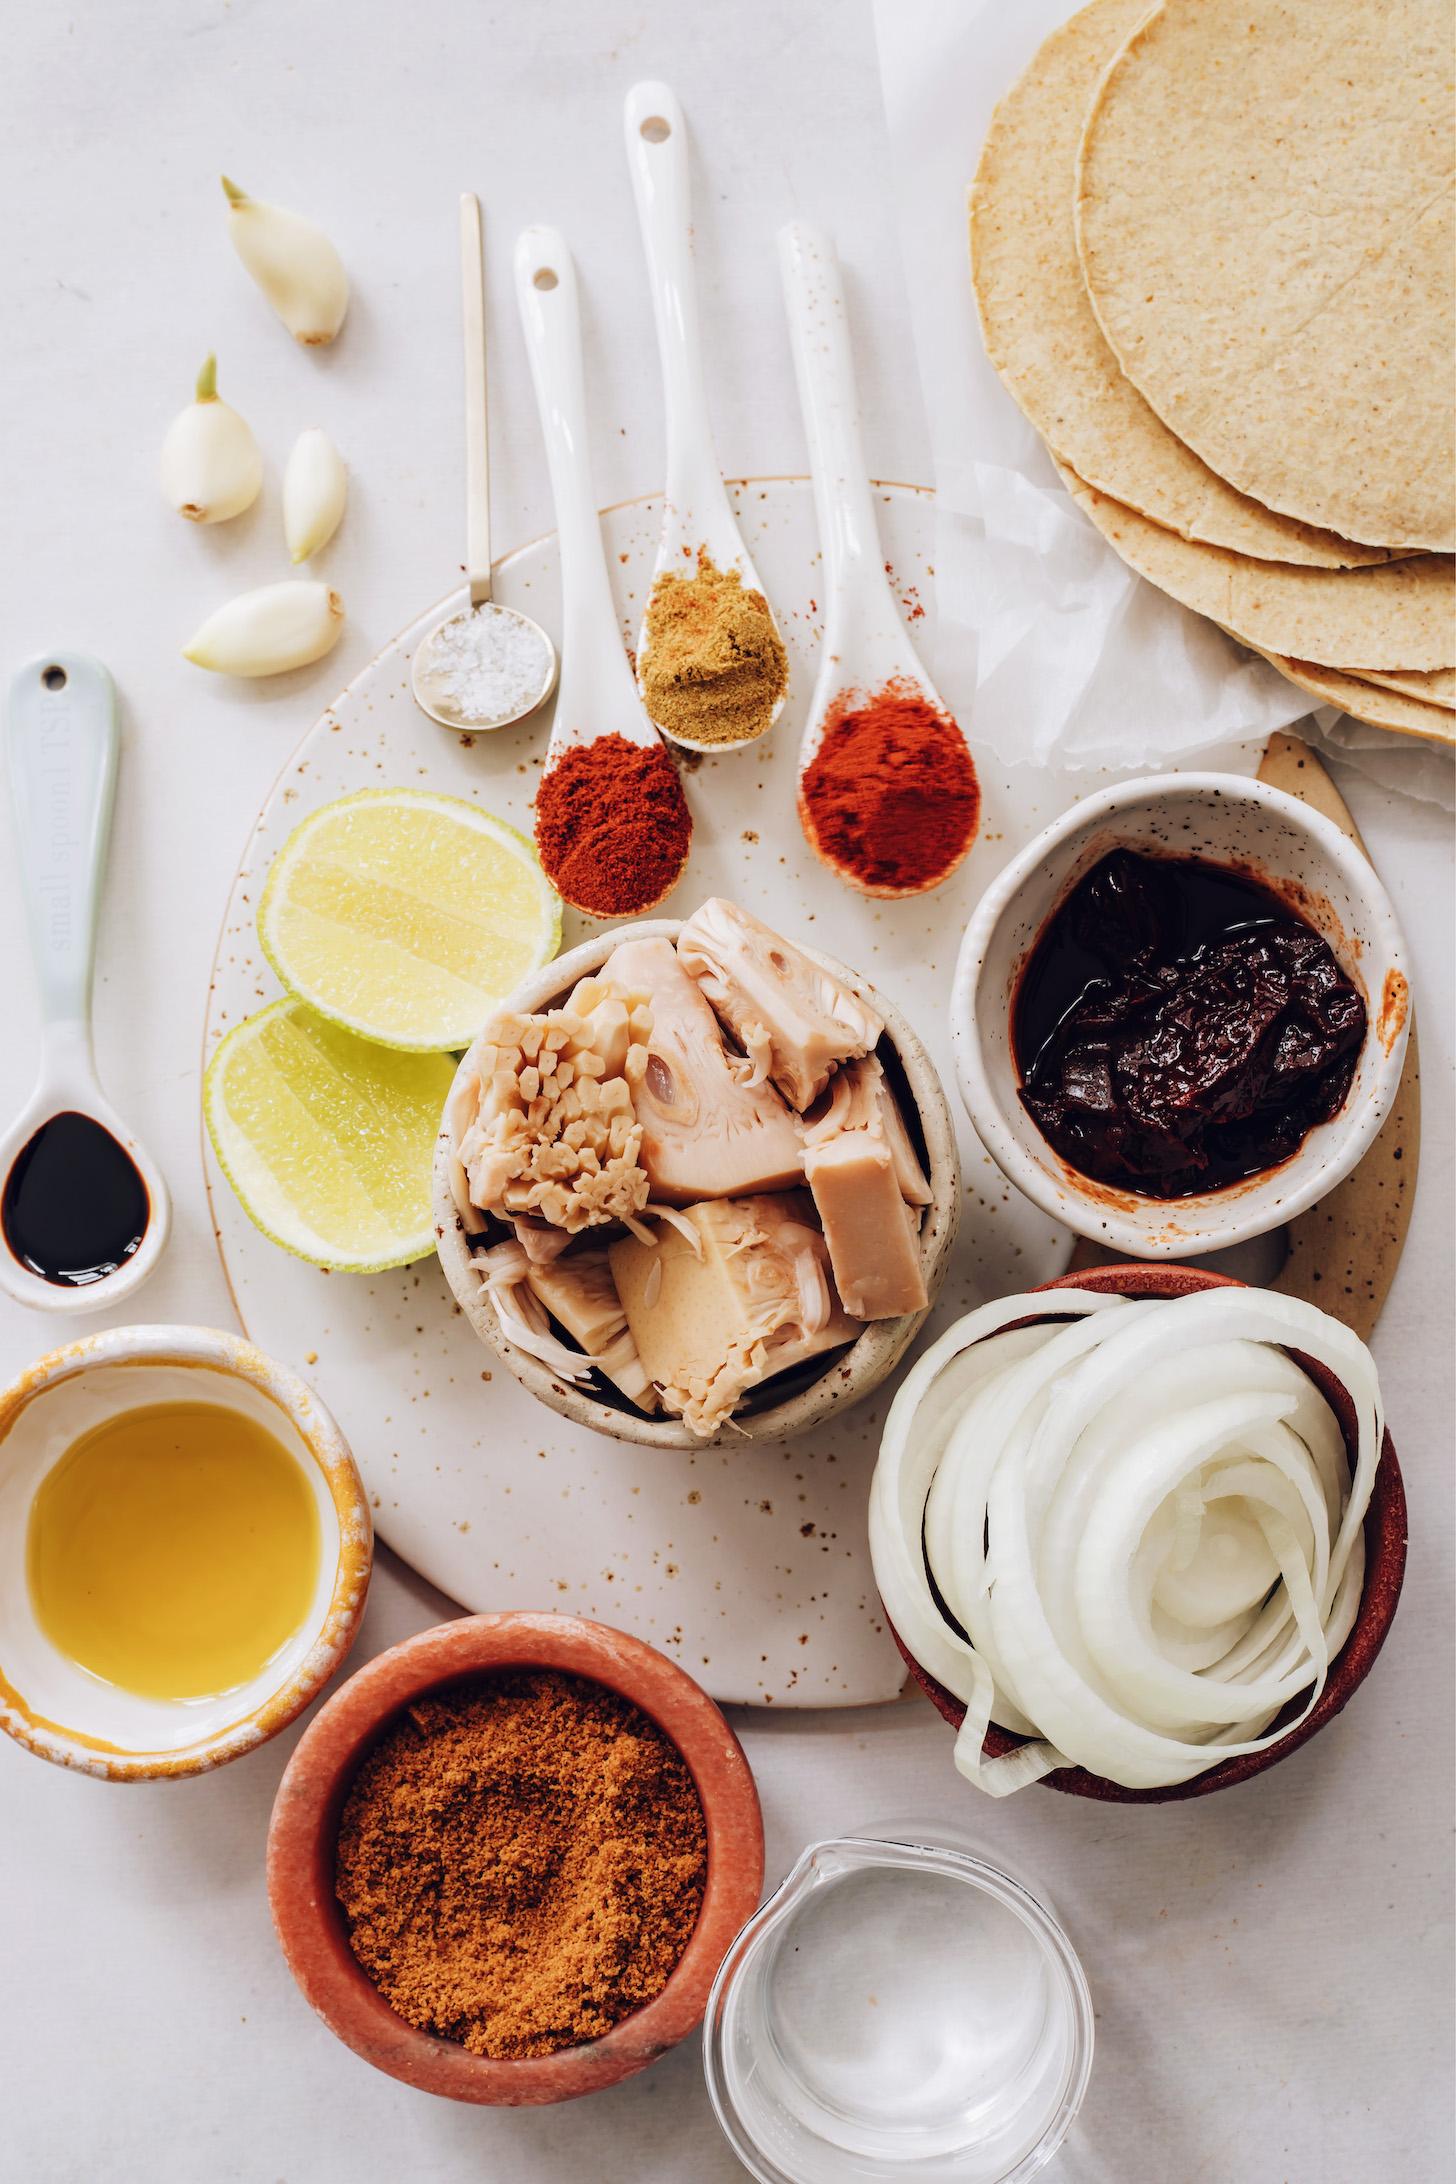 Garlic, salt, lime, spices, jackfruit, adobo pepper, onion, corn tortillas, water, oil, and coconut aminos